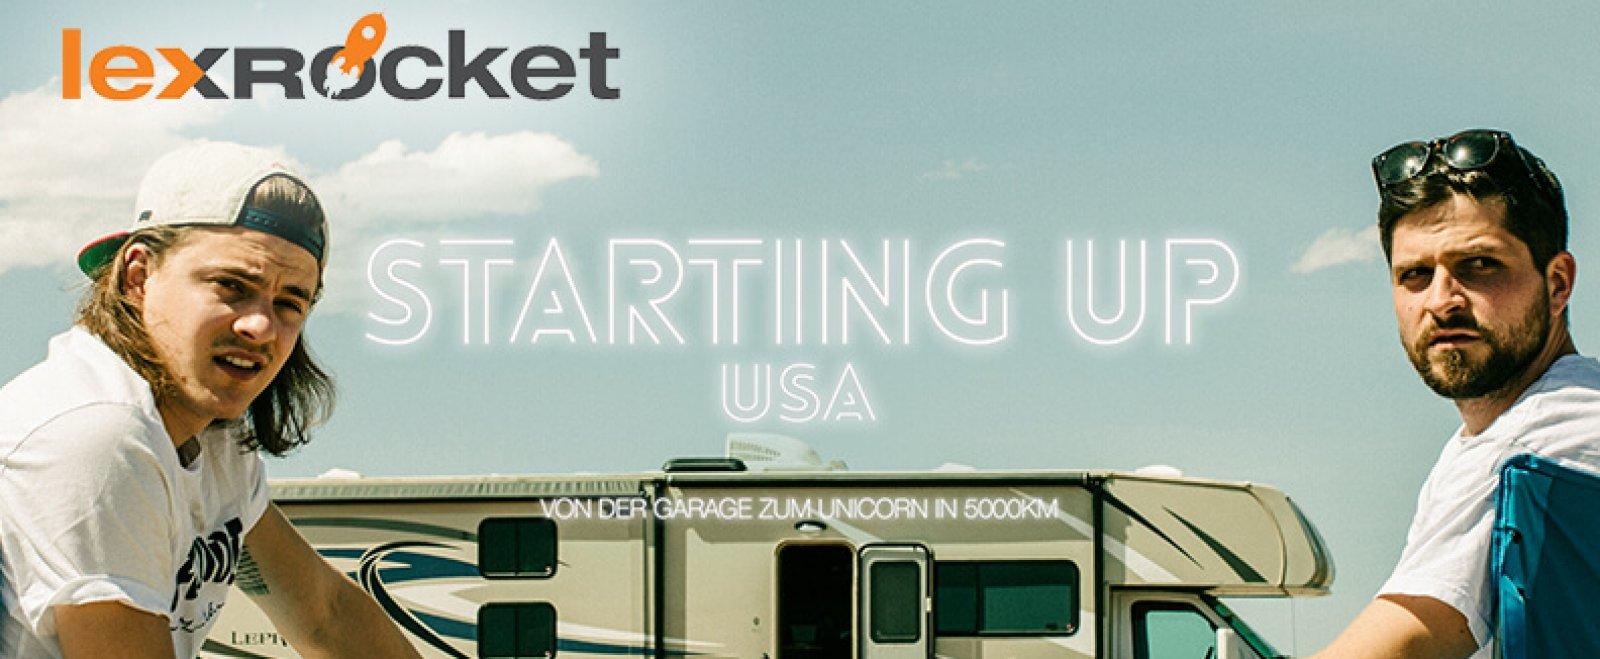 Starting UP USA Filmpremiere - der lexRocket Start-up Accelerator im Silicon Valley